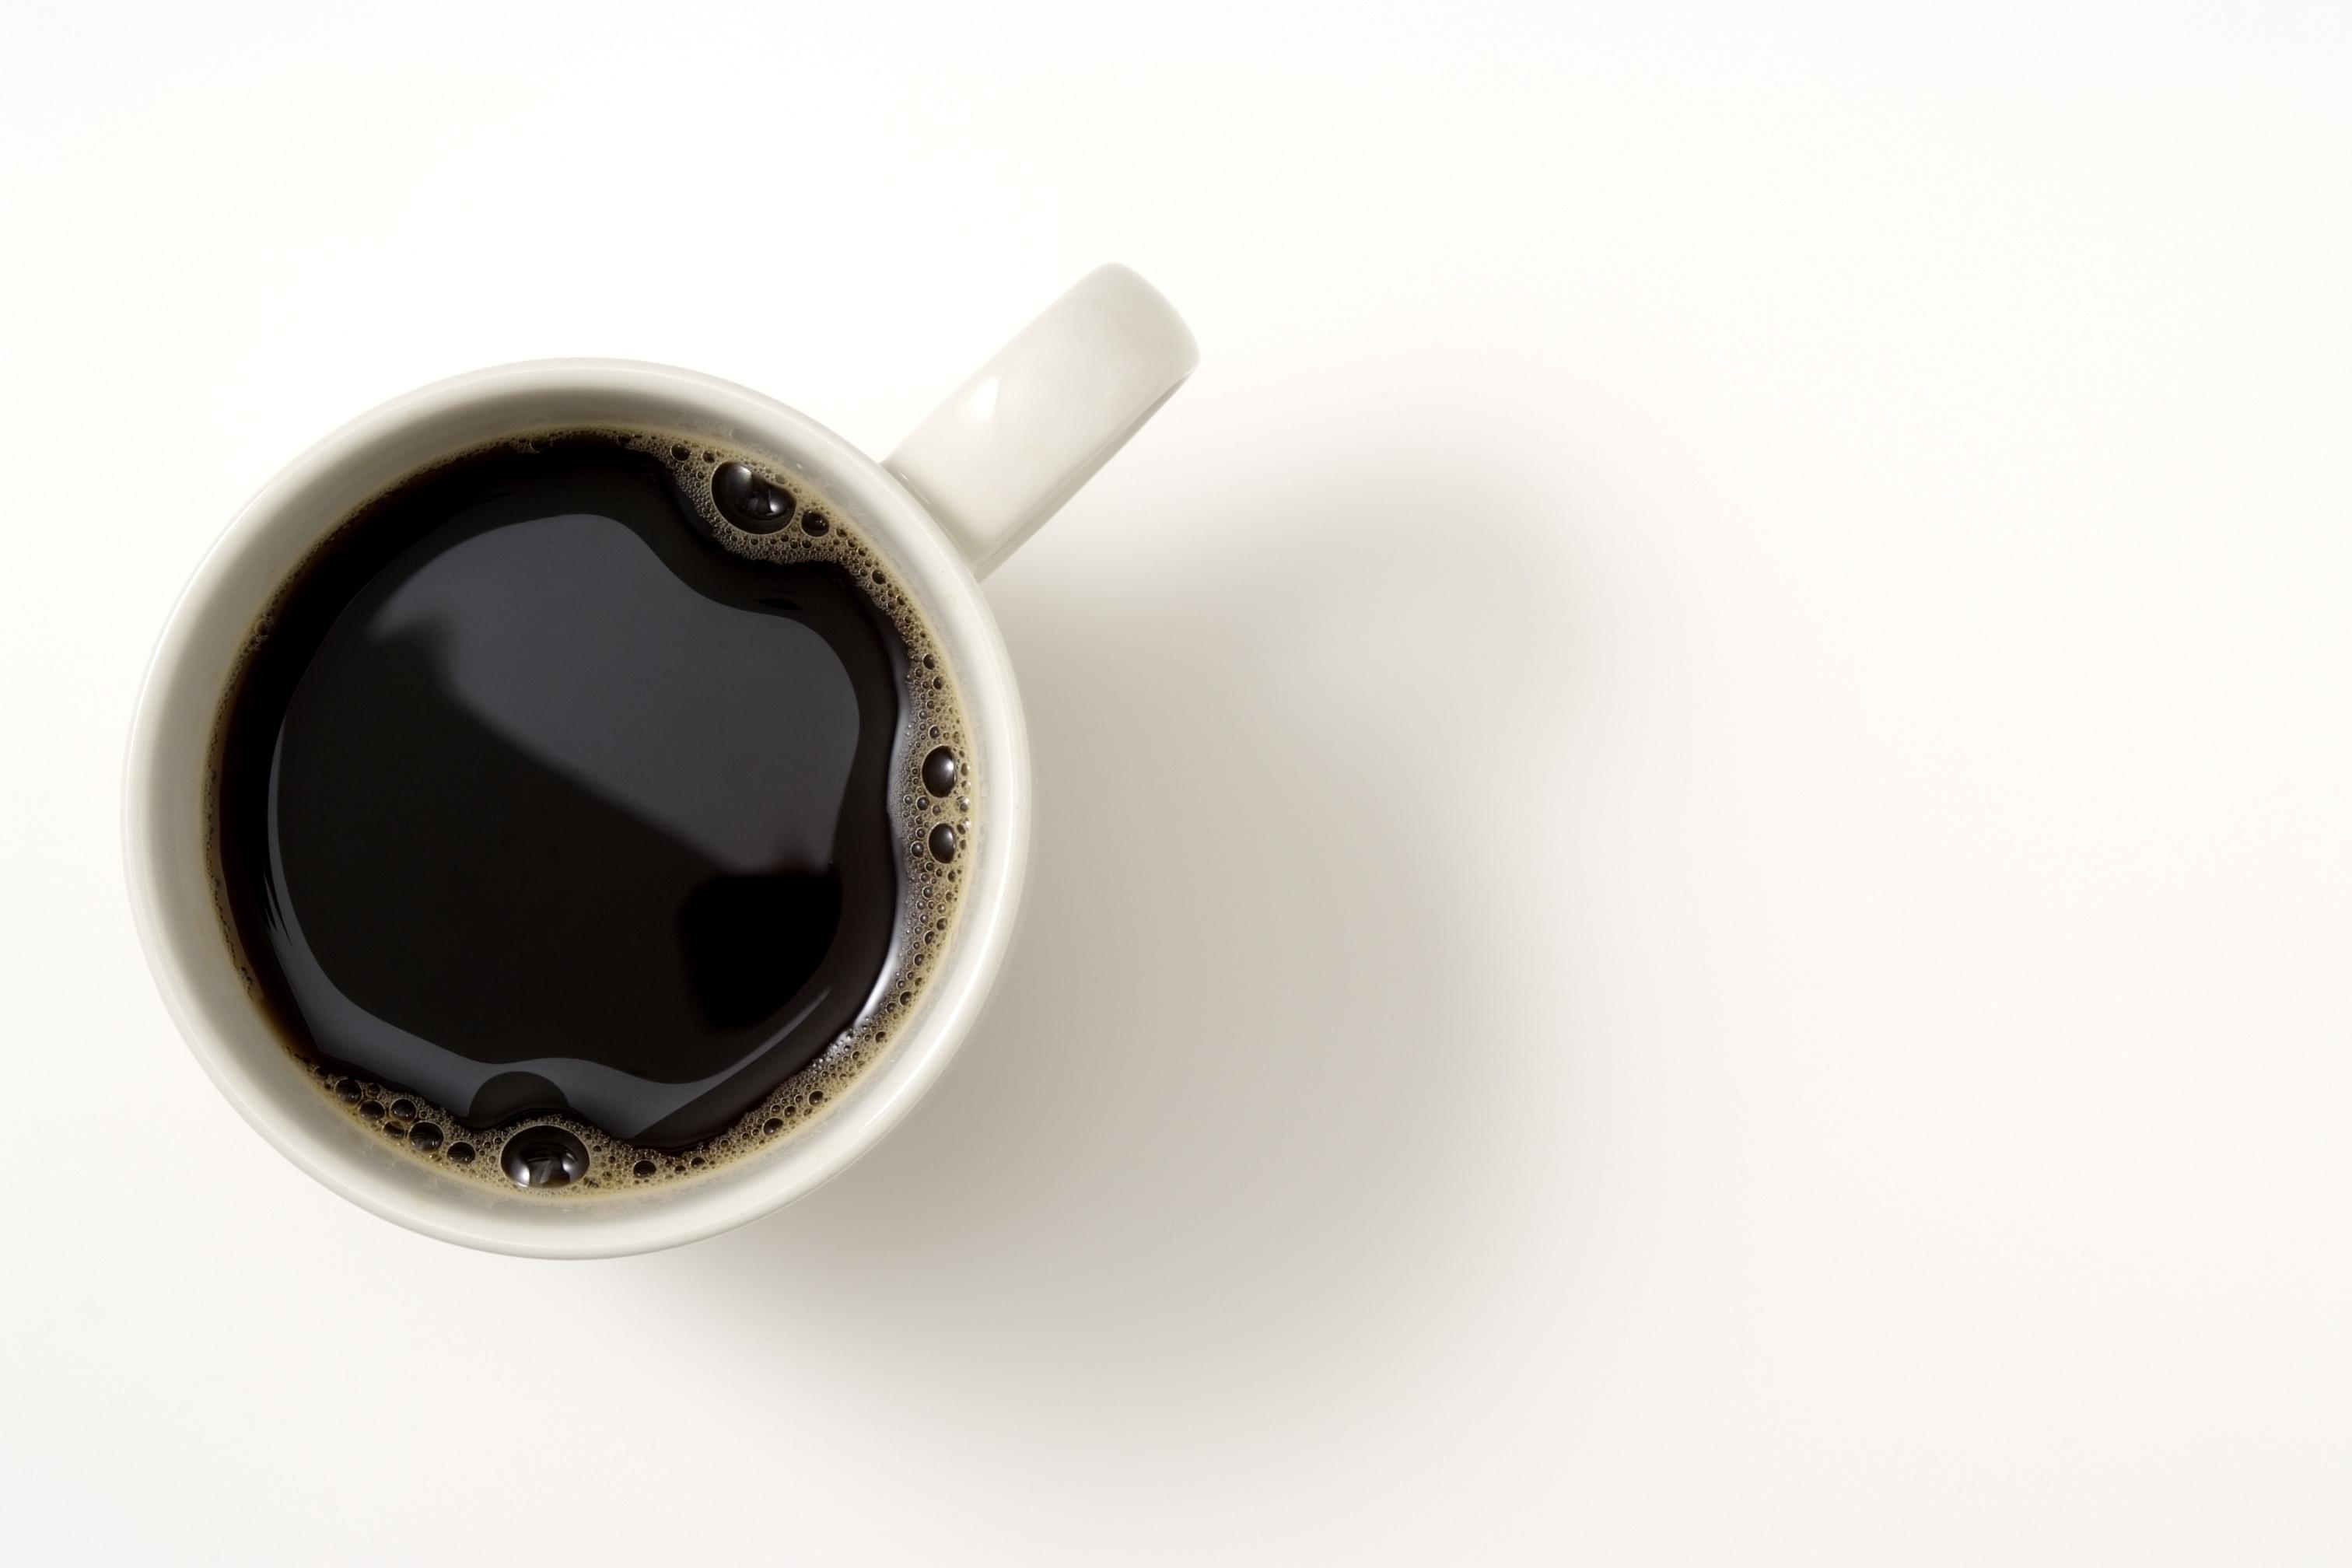 Menina confessa ter colocado veneno no café para matar os pais